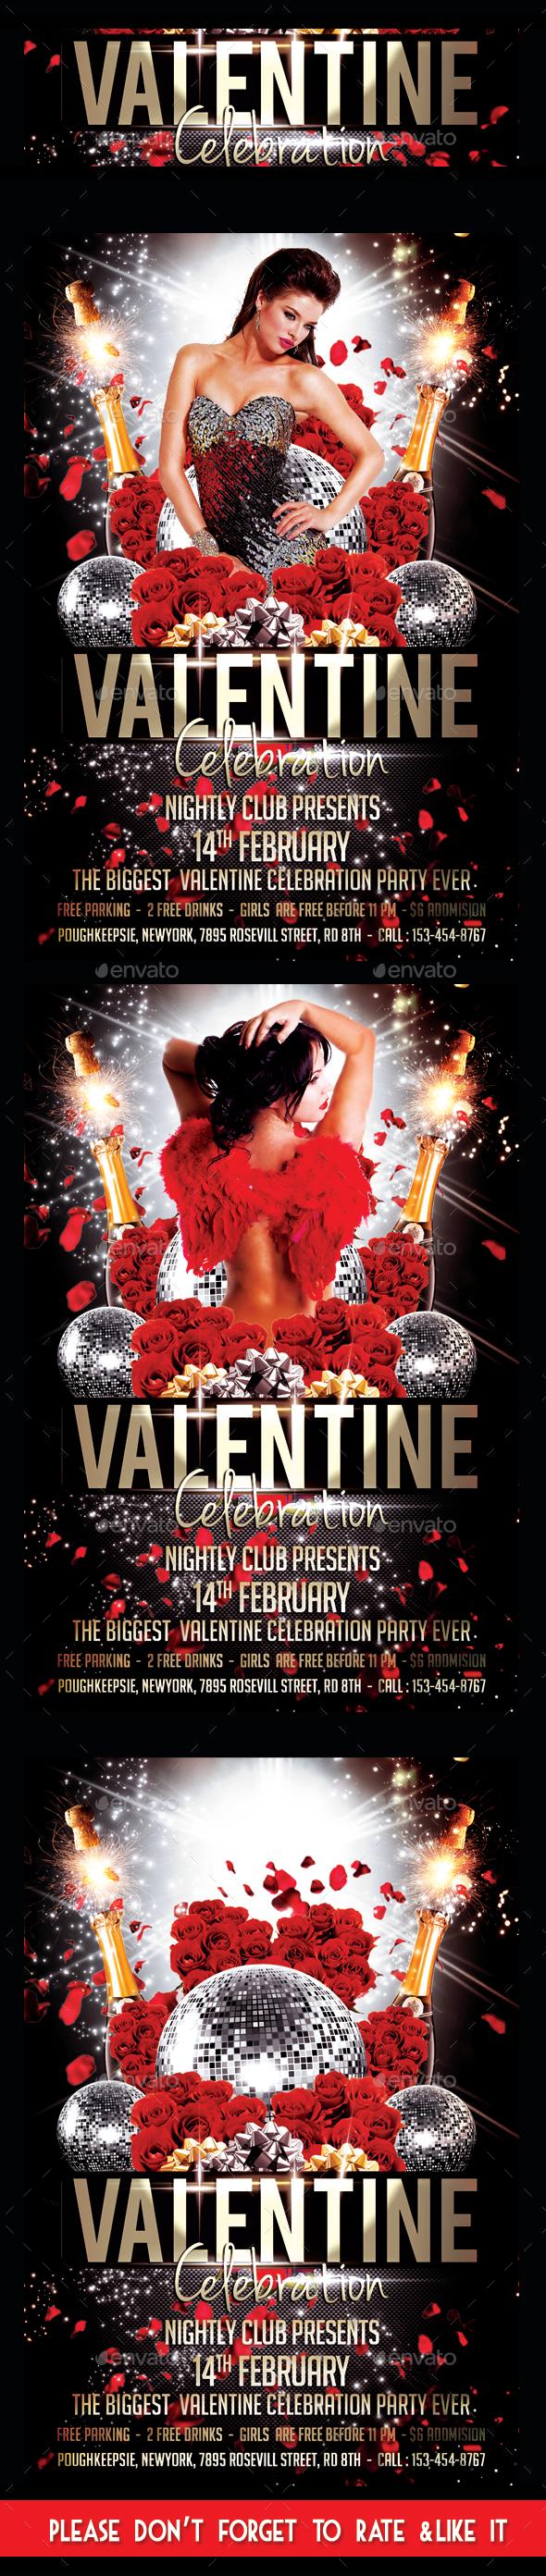 Valentine Day Celebraion Party Flyer - Flyers Print Templates